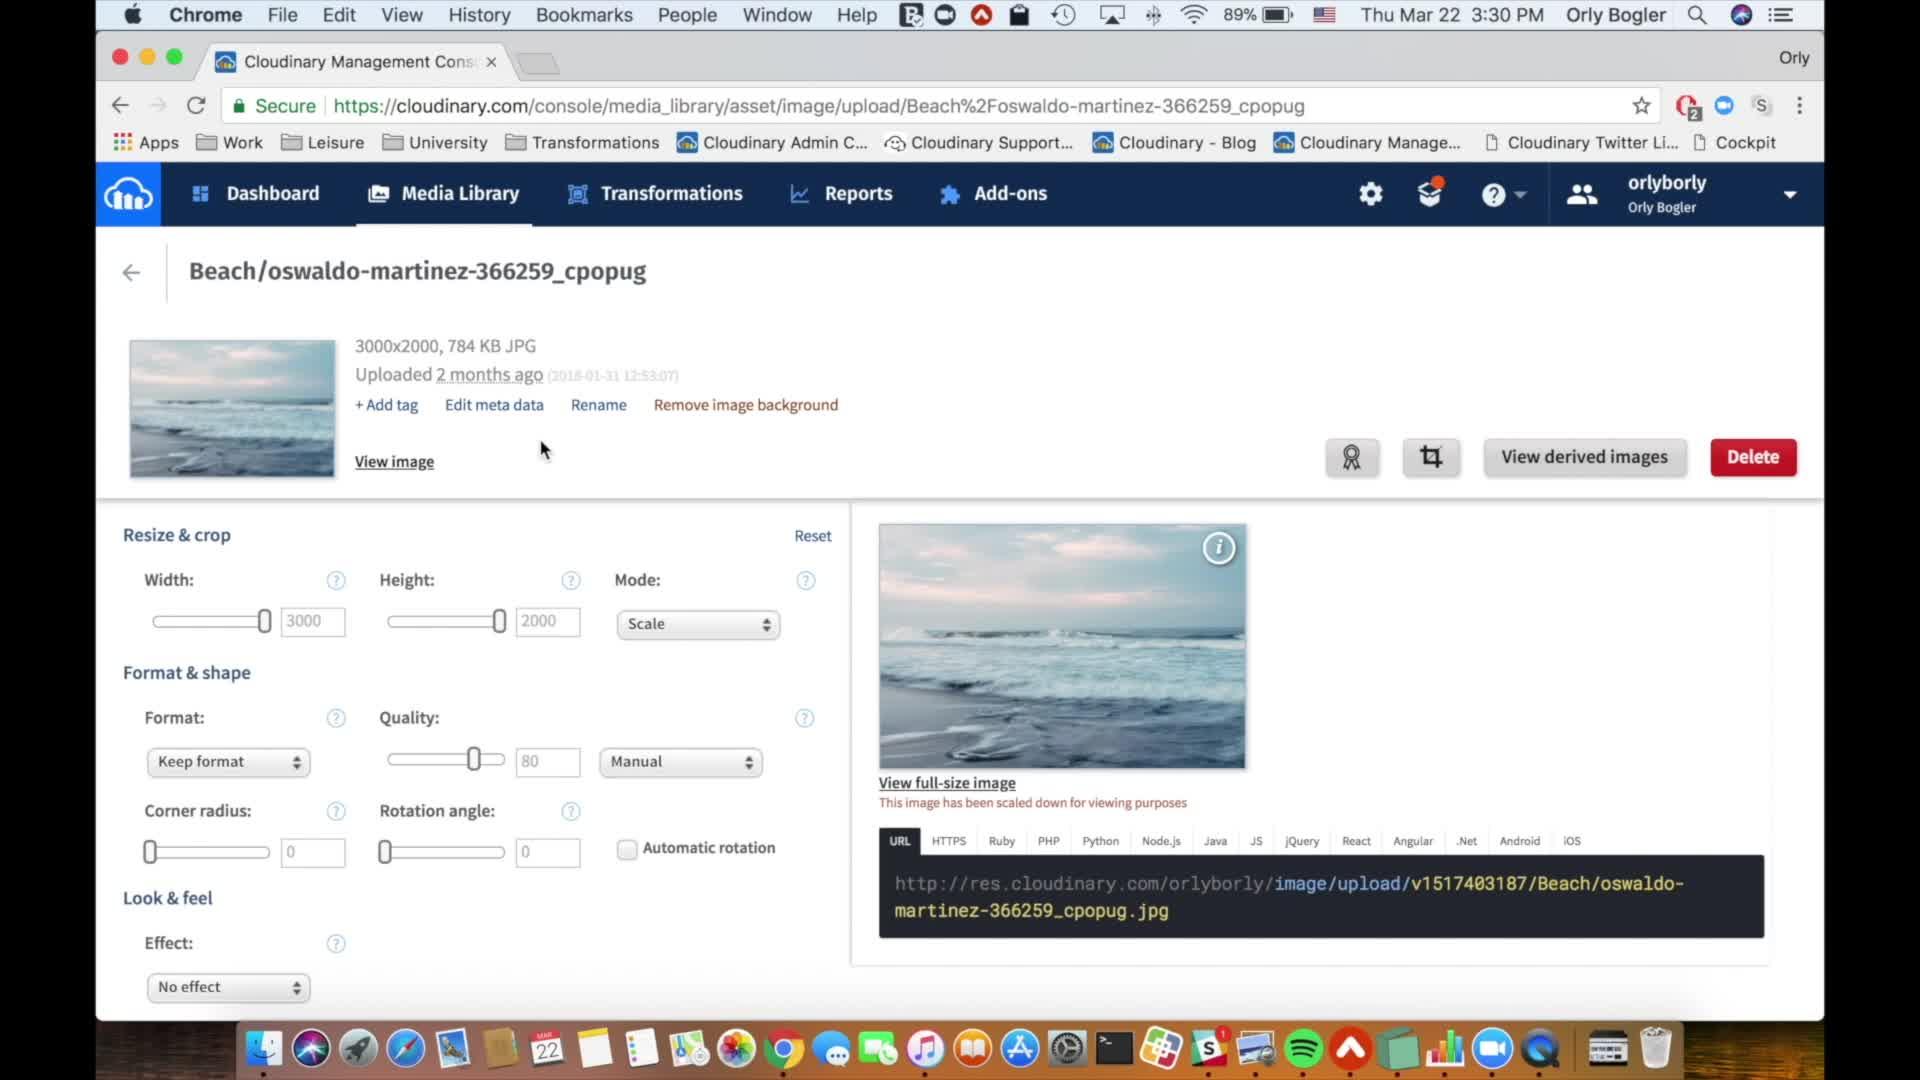 Cloudinary Tutorial Screencast Videos | Cloudinary